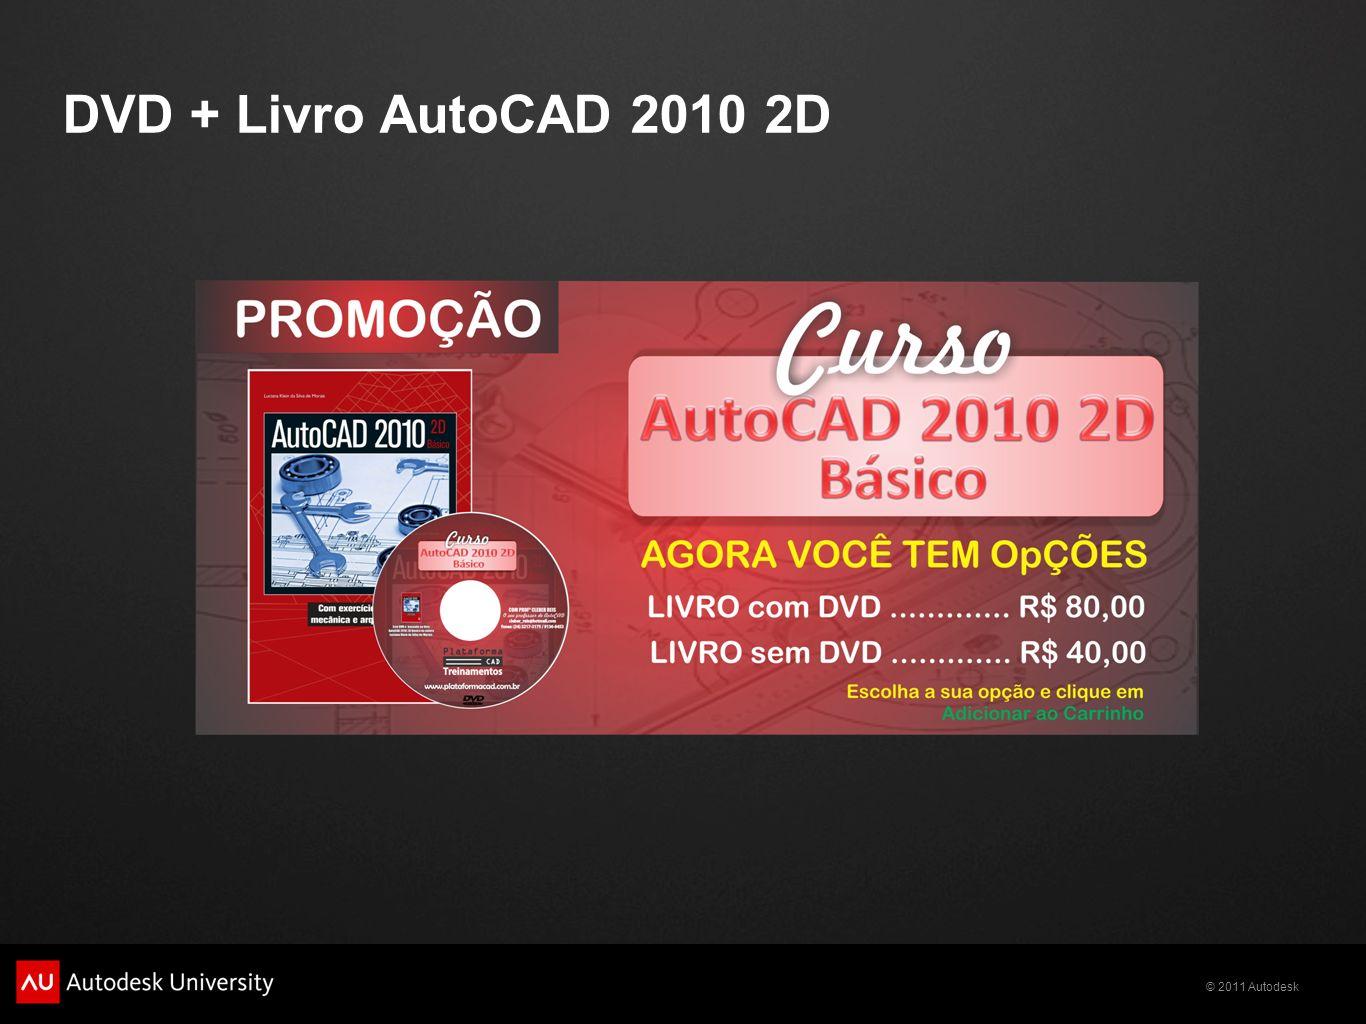 DVD + Livro AutoCAD 2010 2D